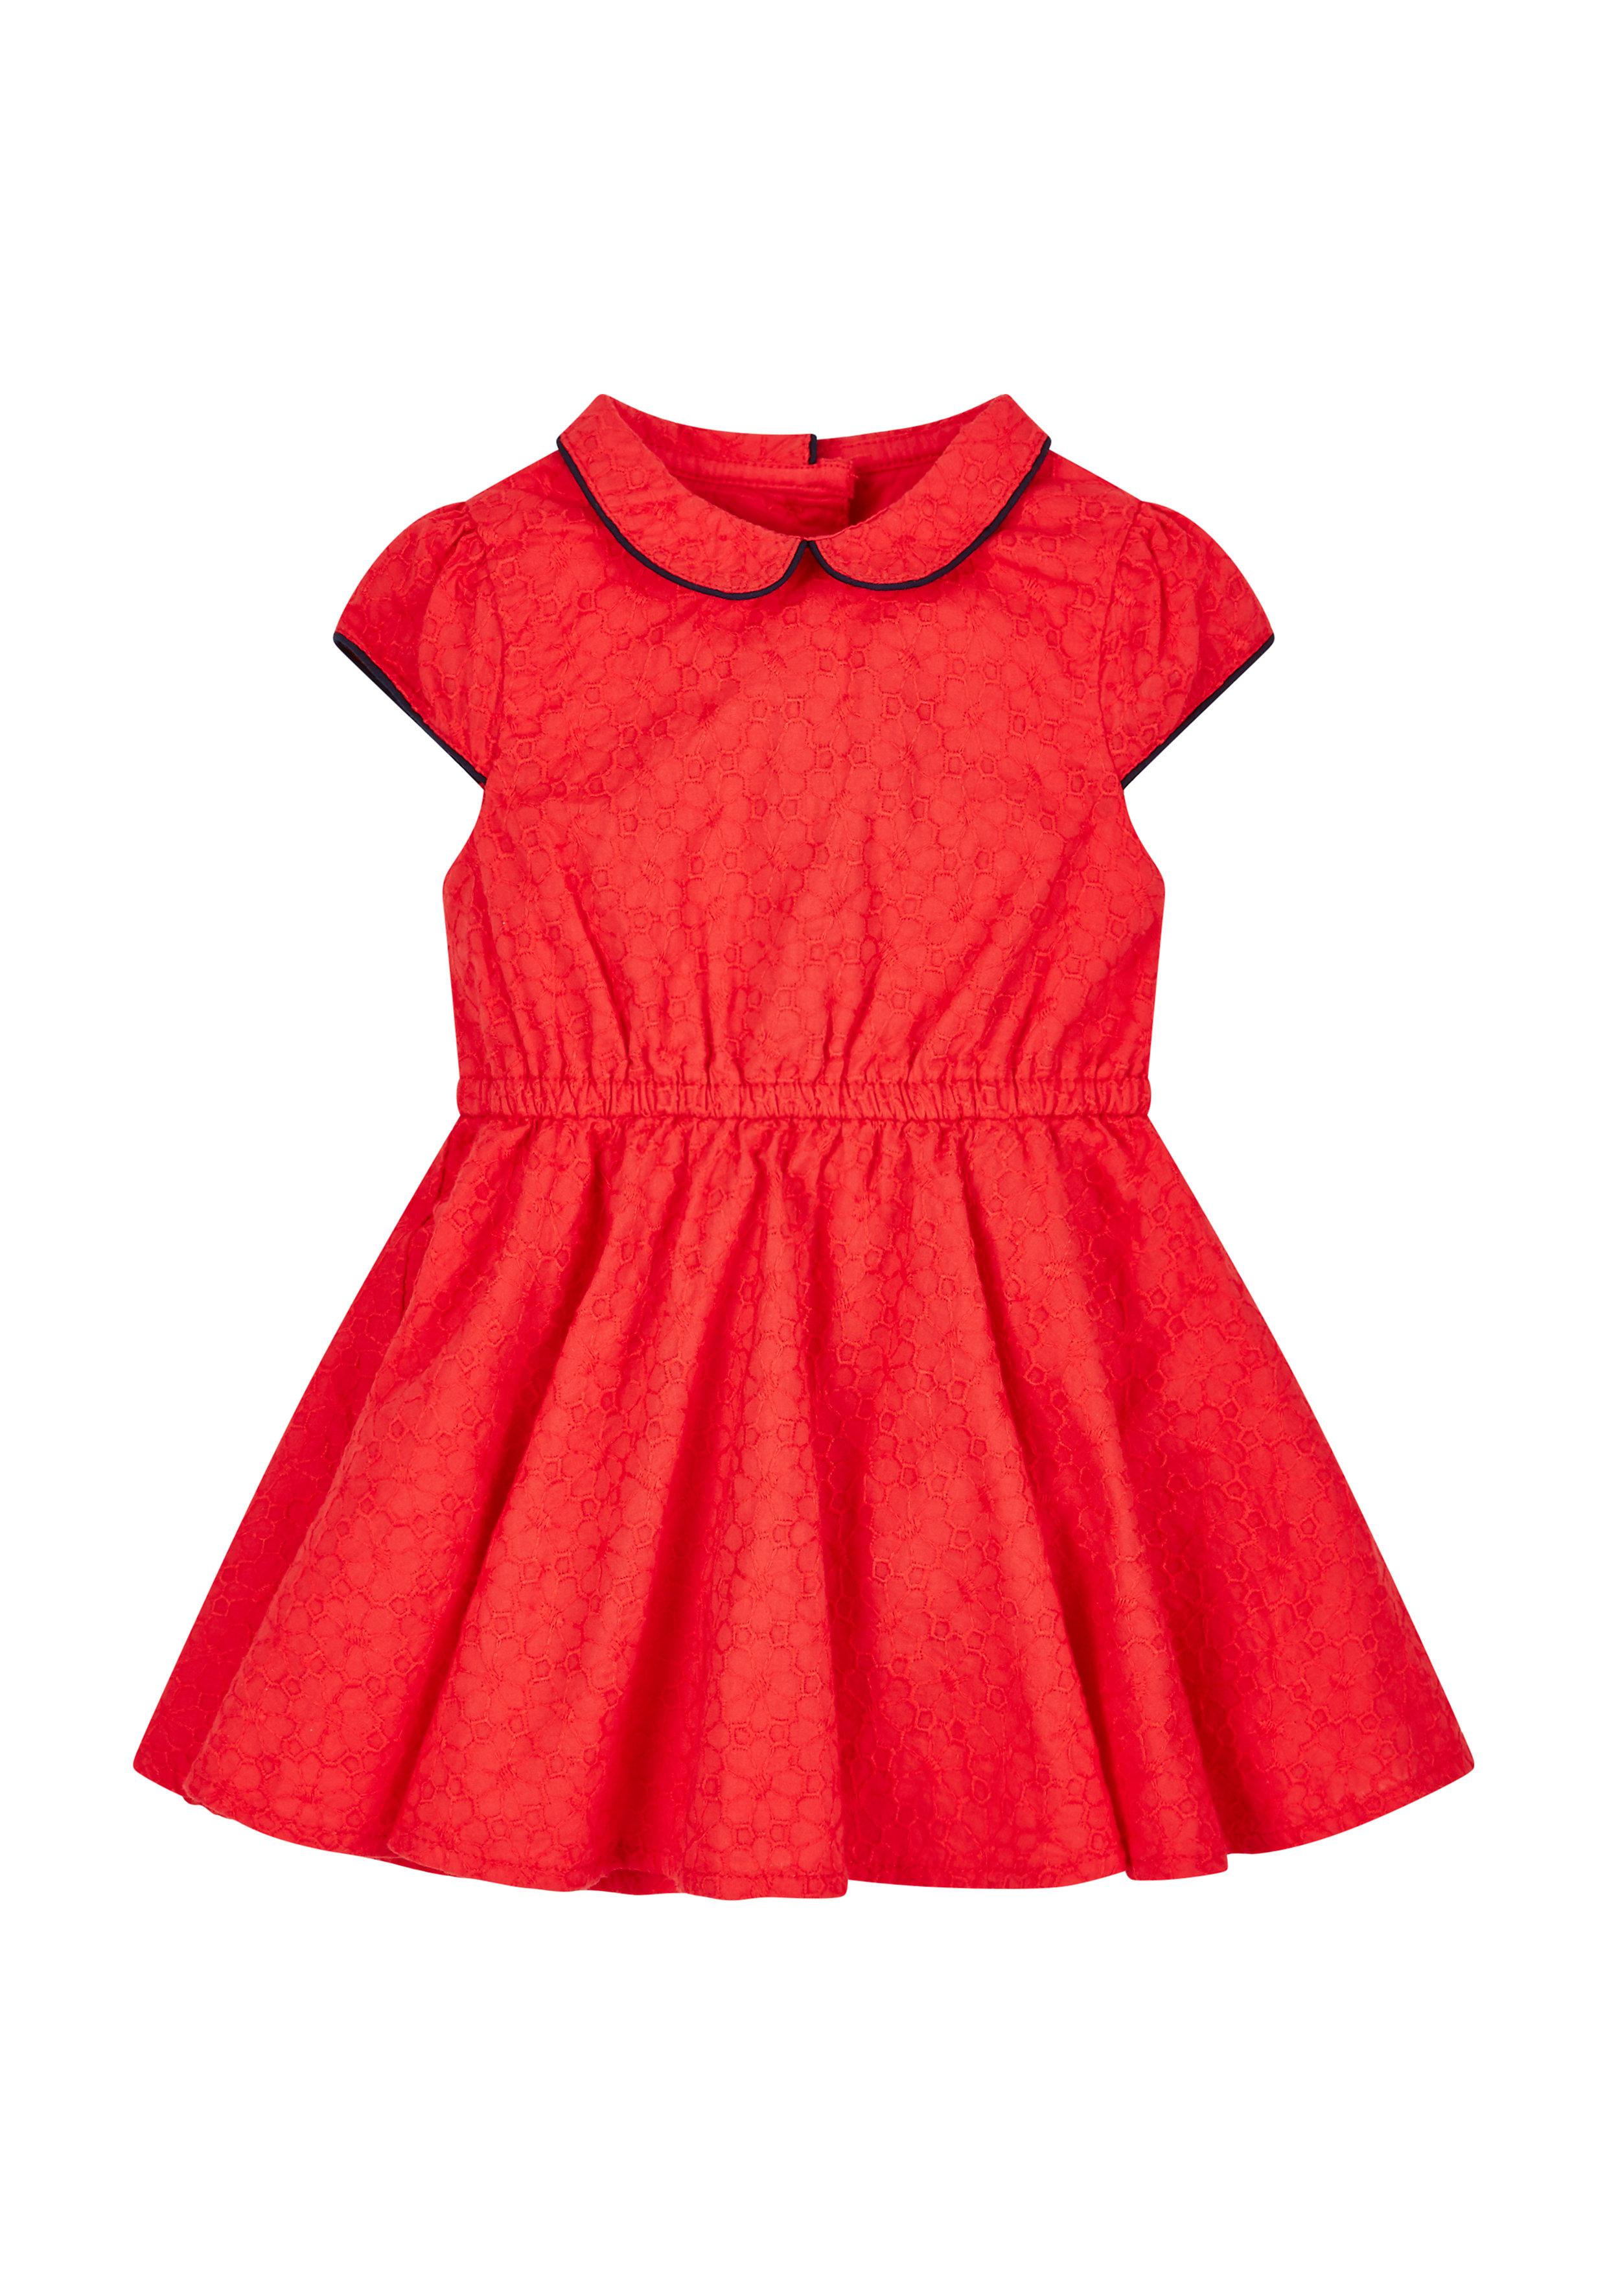 Mothercare | Girls Red Schiffli Dress